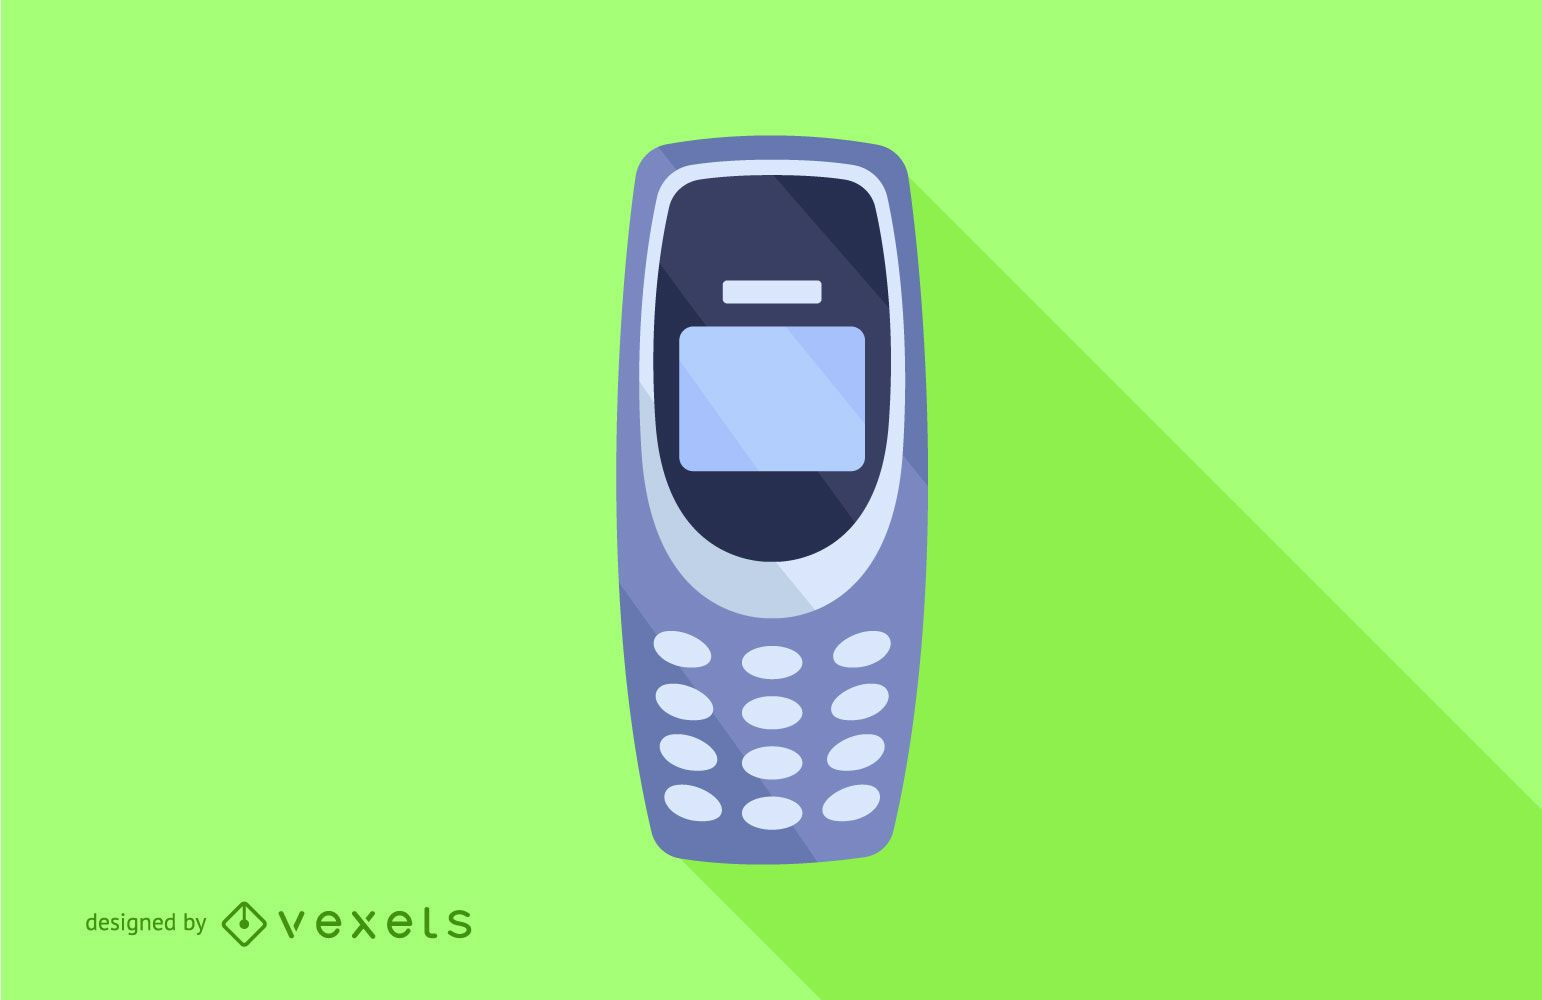 Button Mobile Phone Flat Long Shadow Design